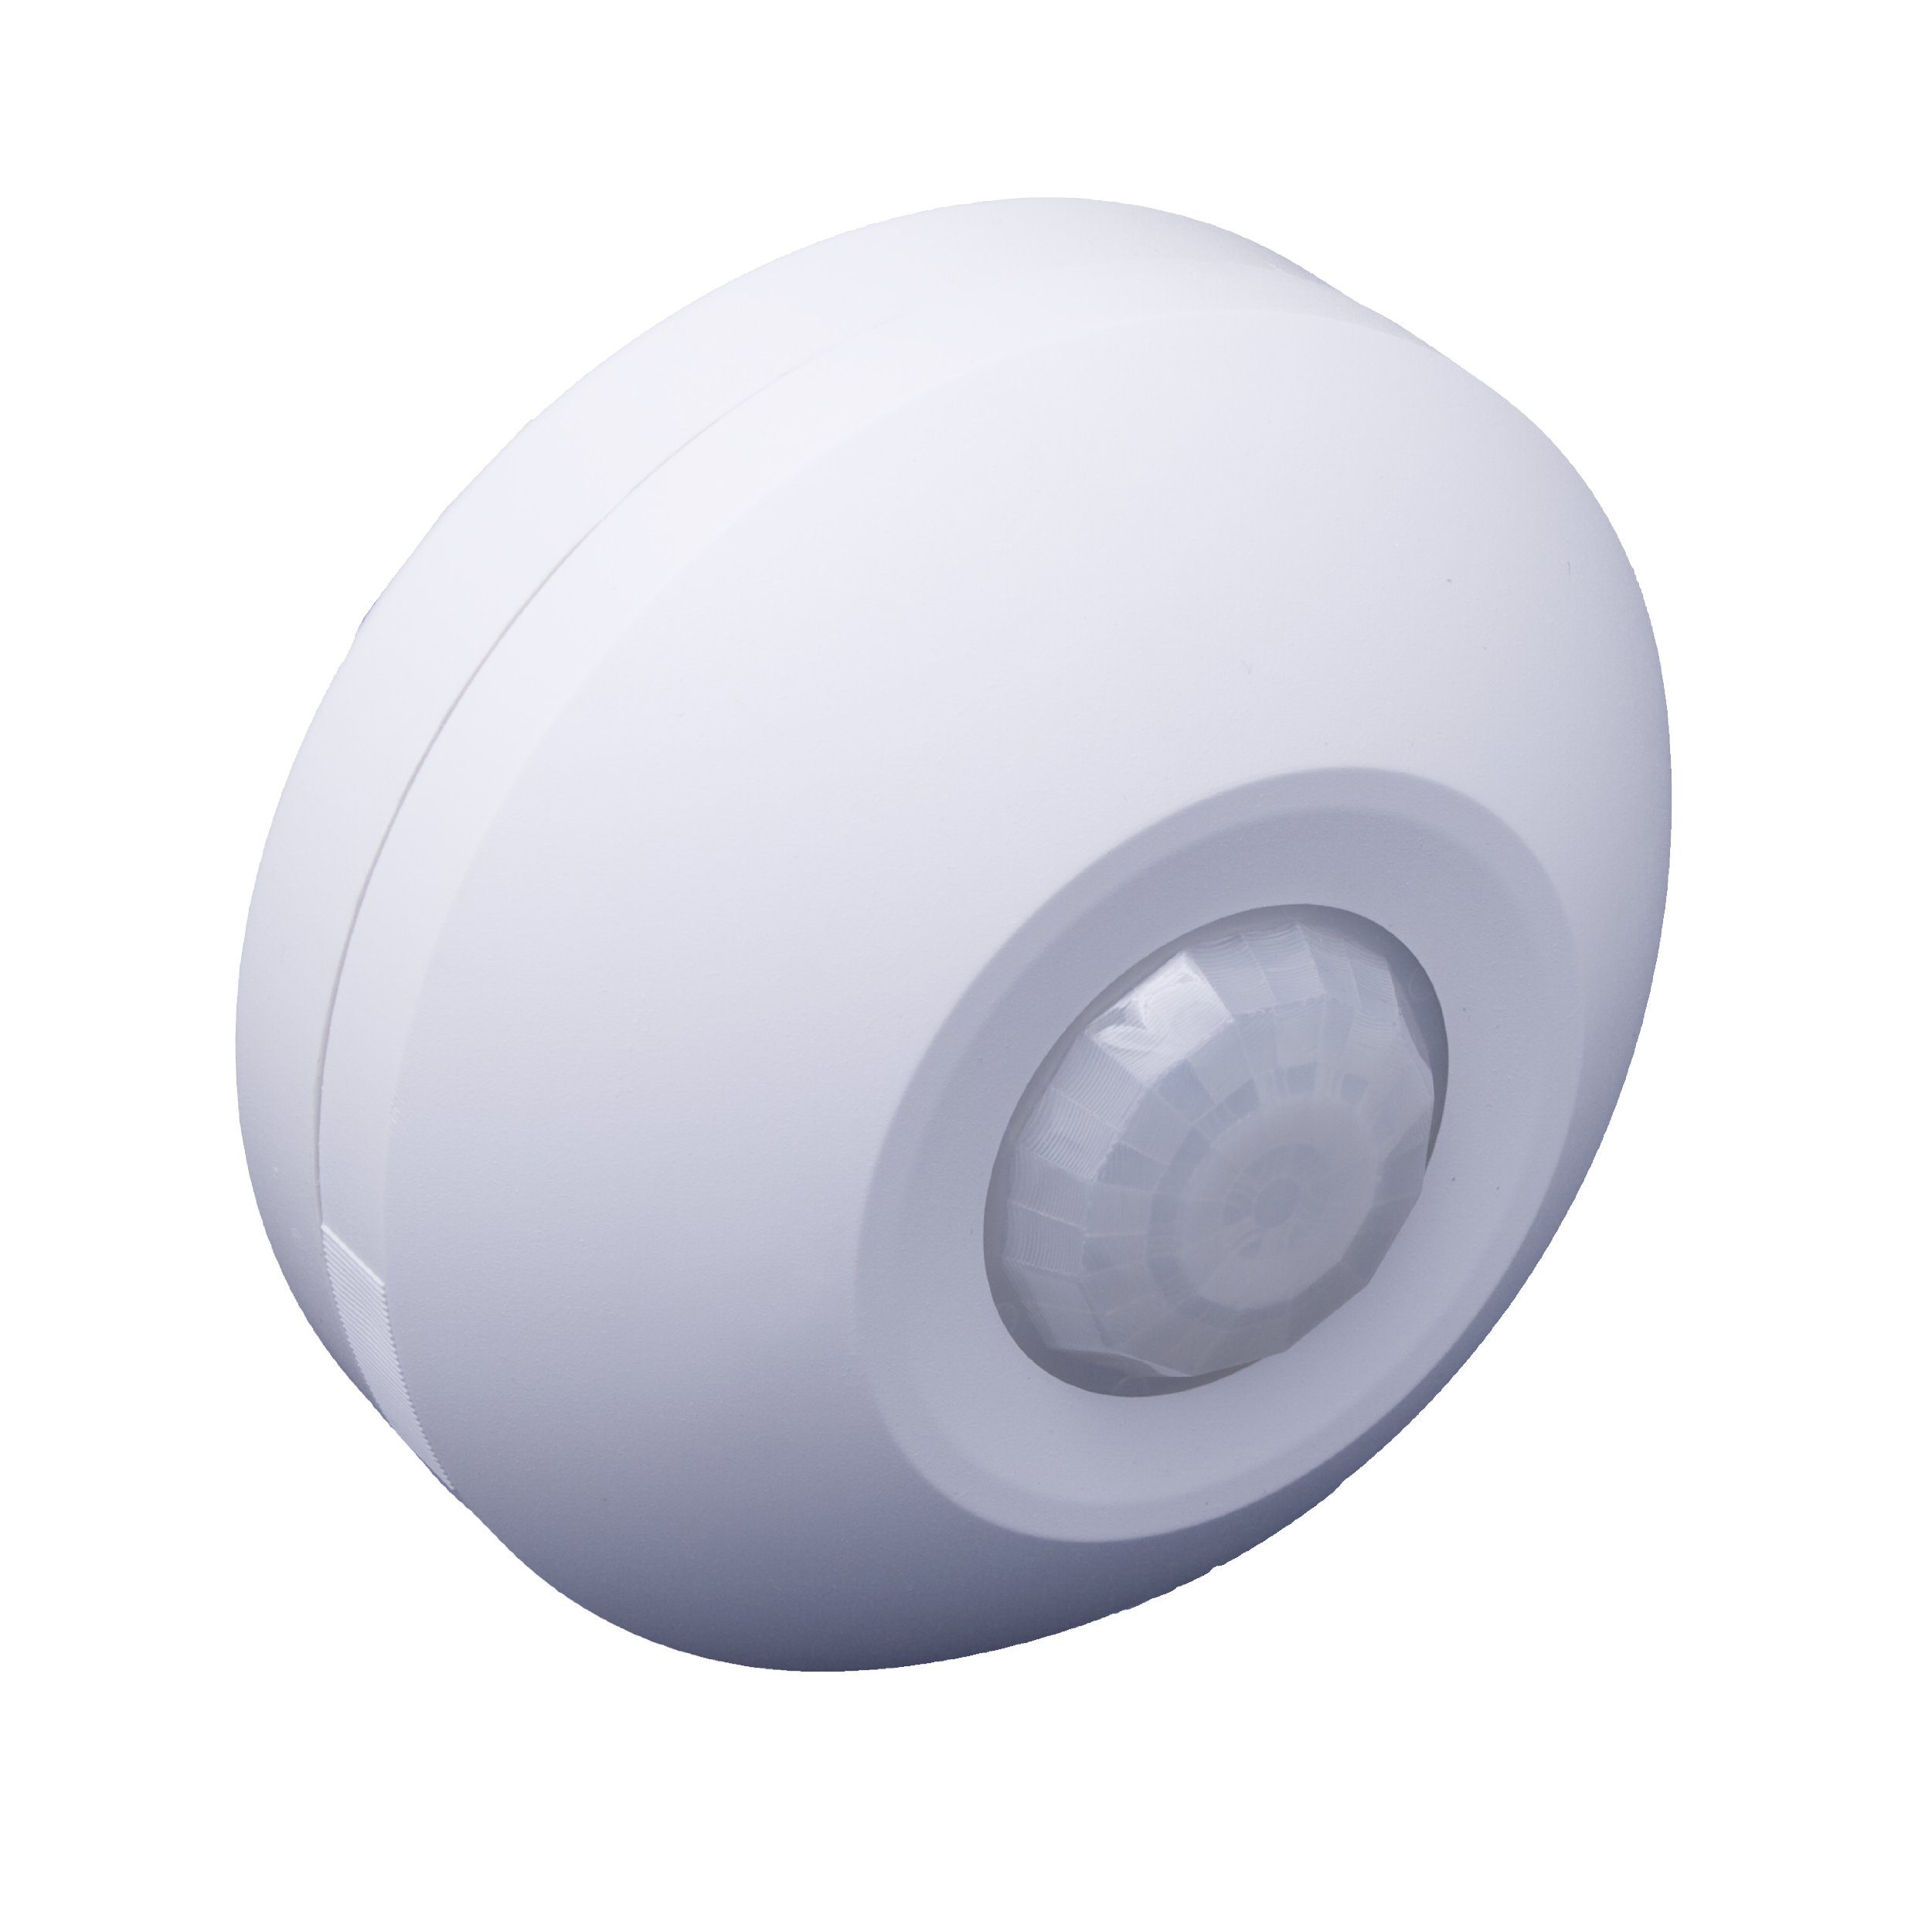 Leviton ODC0S-I7W Ceiling Mount Self-Contained Occupancy Sensor, 2700VA FL, 277VAC 60Hz, PIR, 360 Degree, 530 sq. ft. Coverage, White